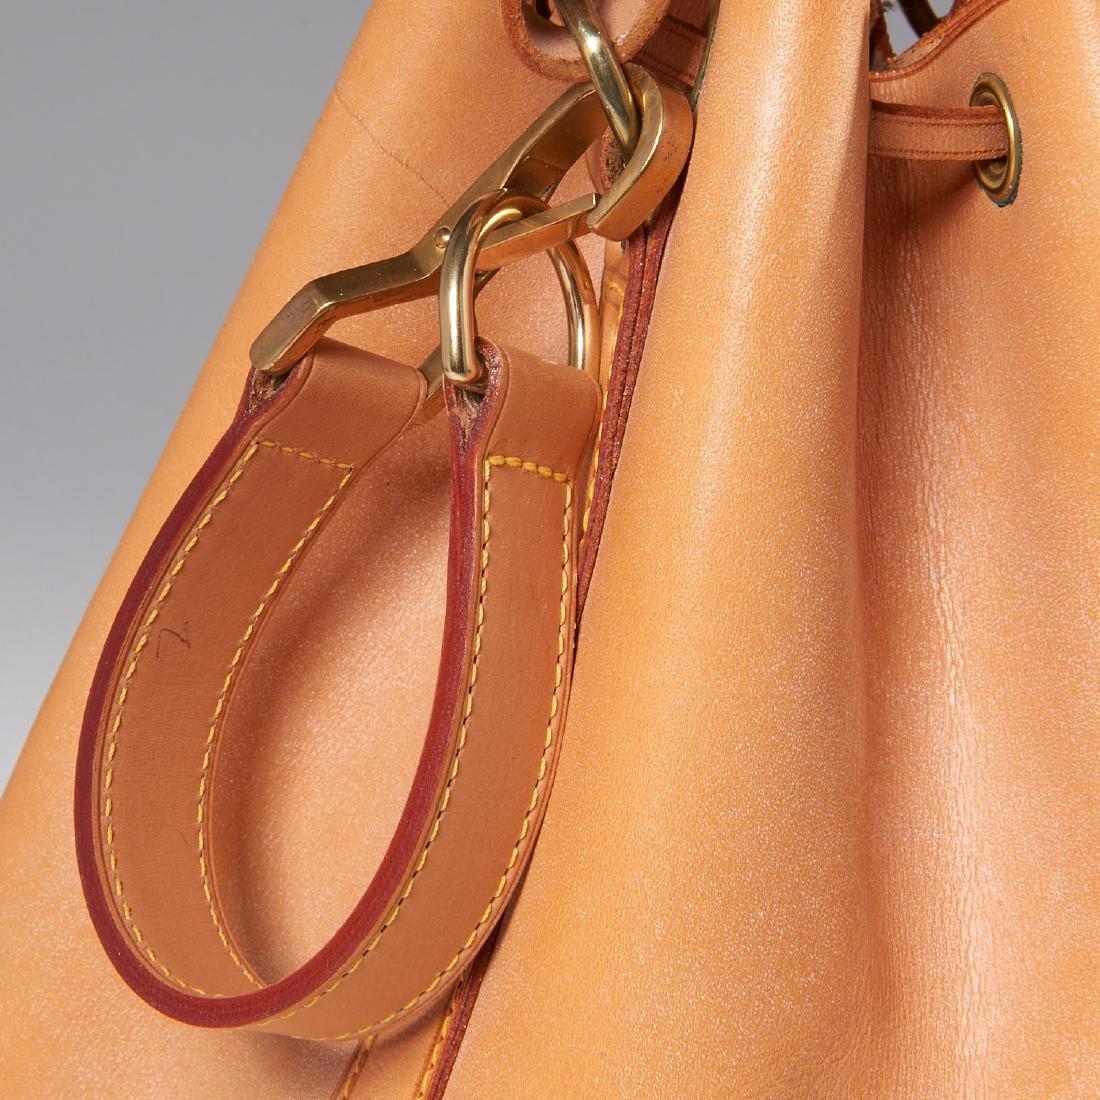 Louis Vuitton all leather drawstring handbag - 3